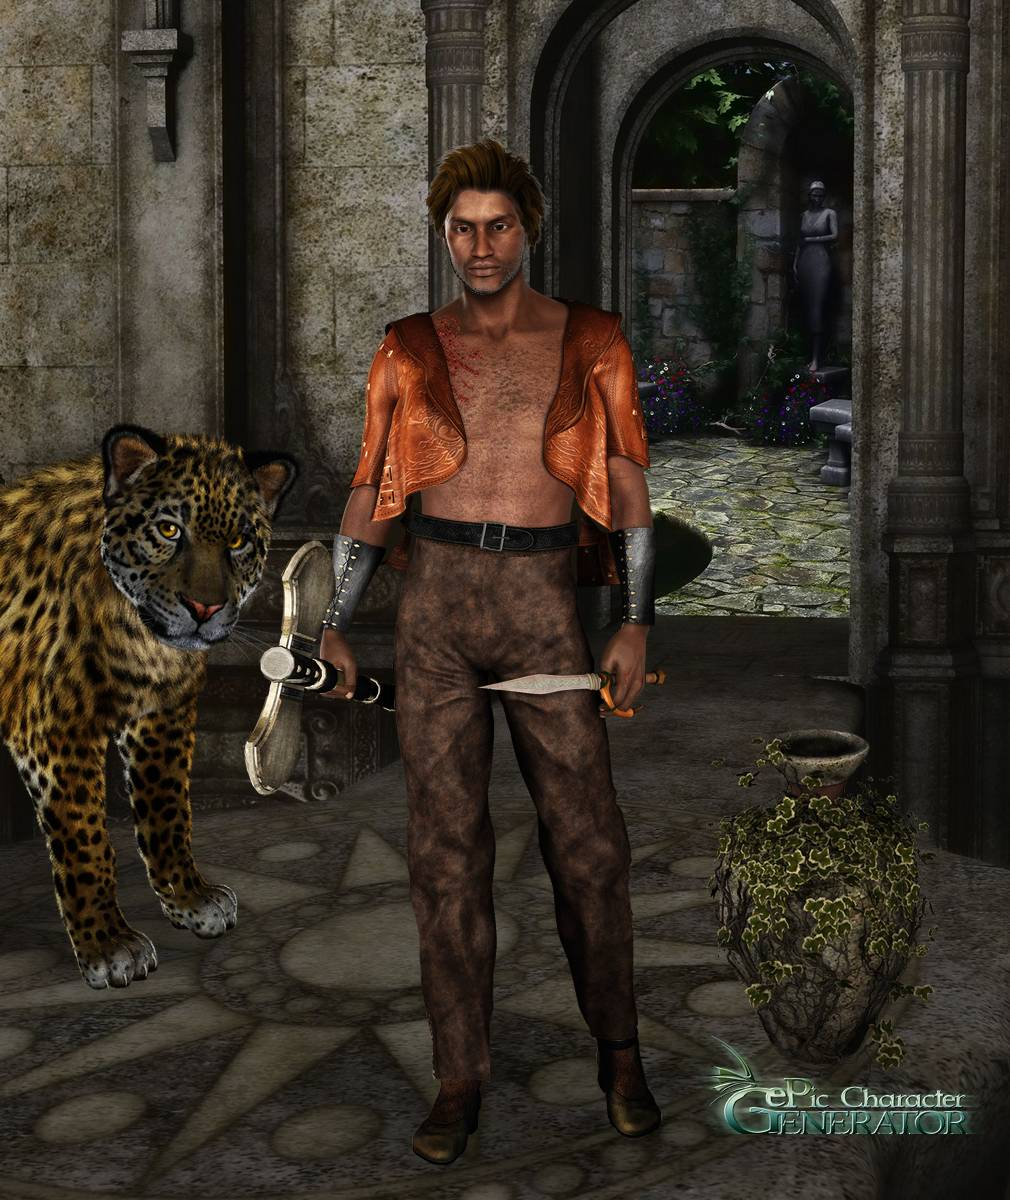 ePic Character Generator Season 2 Male Adventurer Screenshot 09